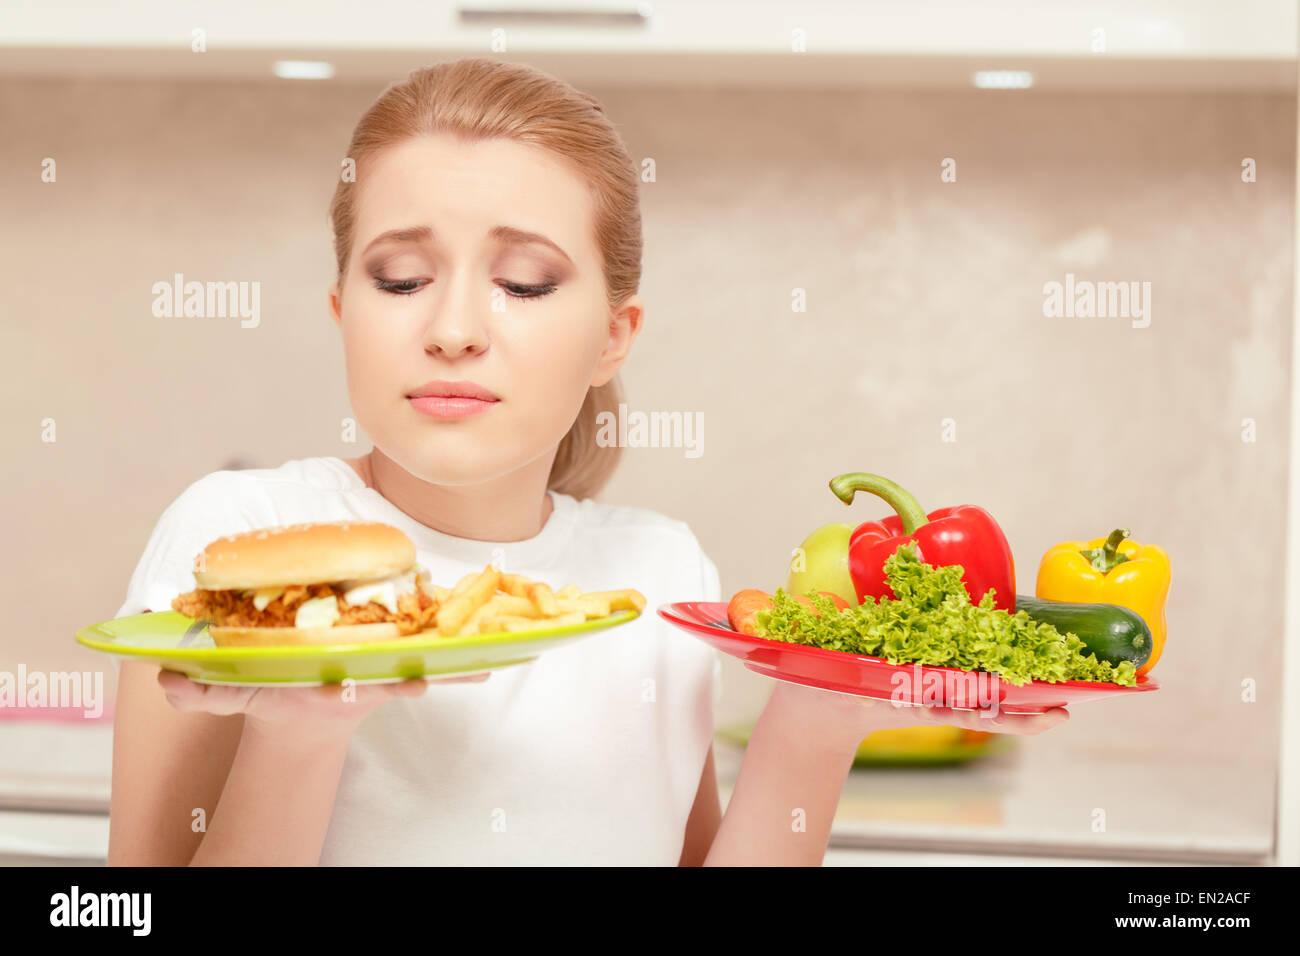 Junge Frau Wahl Mittagessen Stockbild